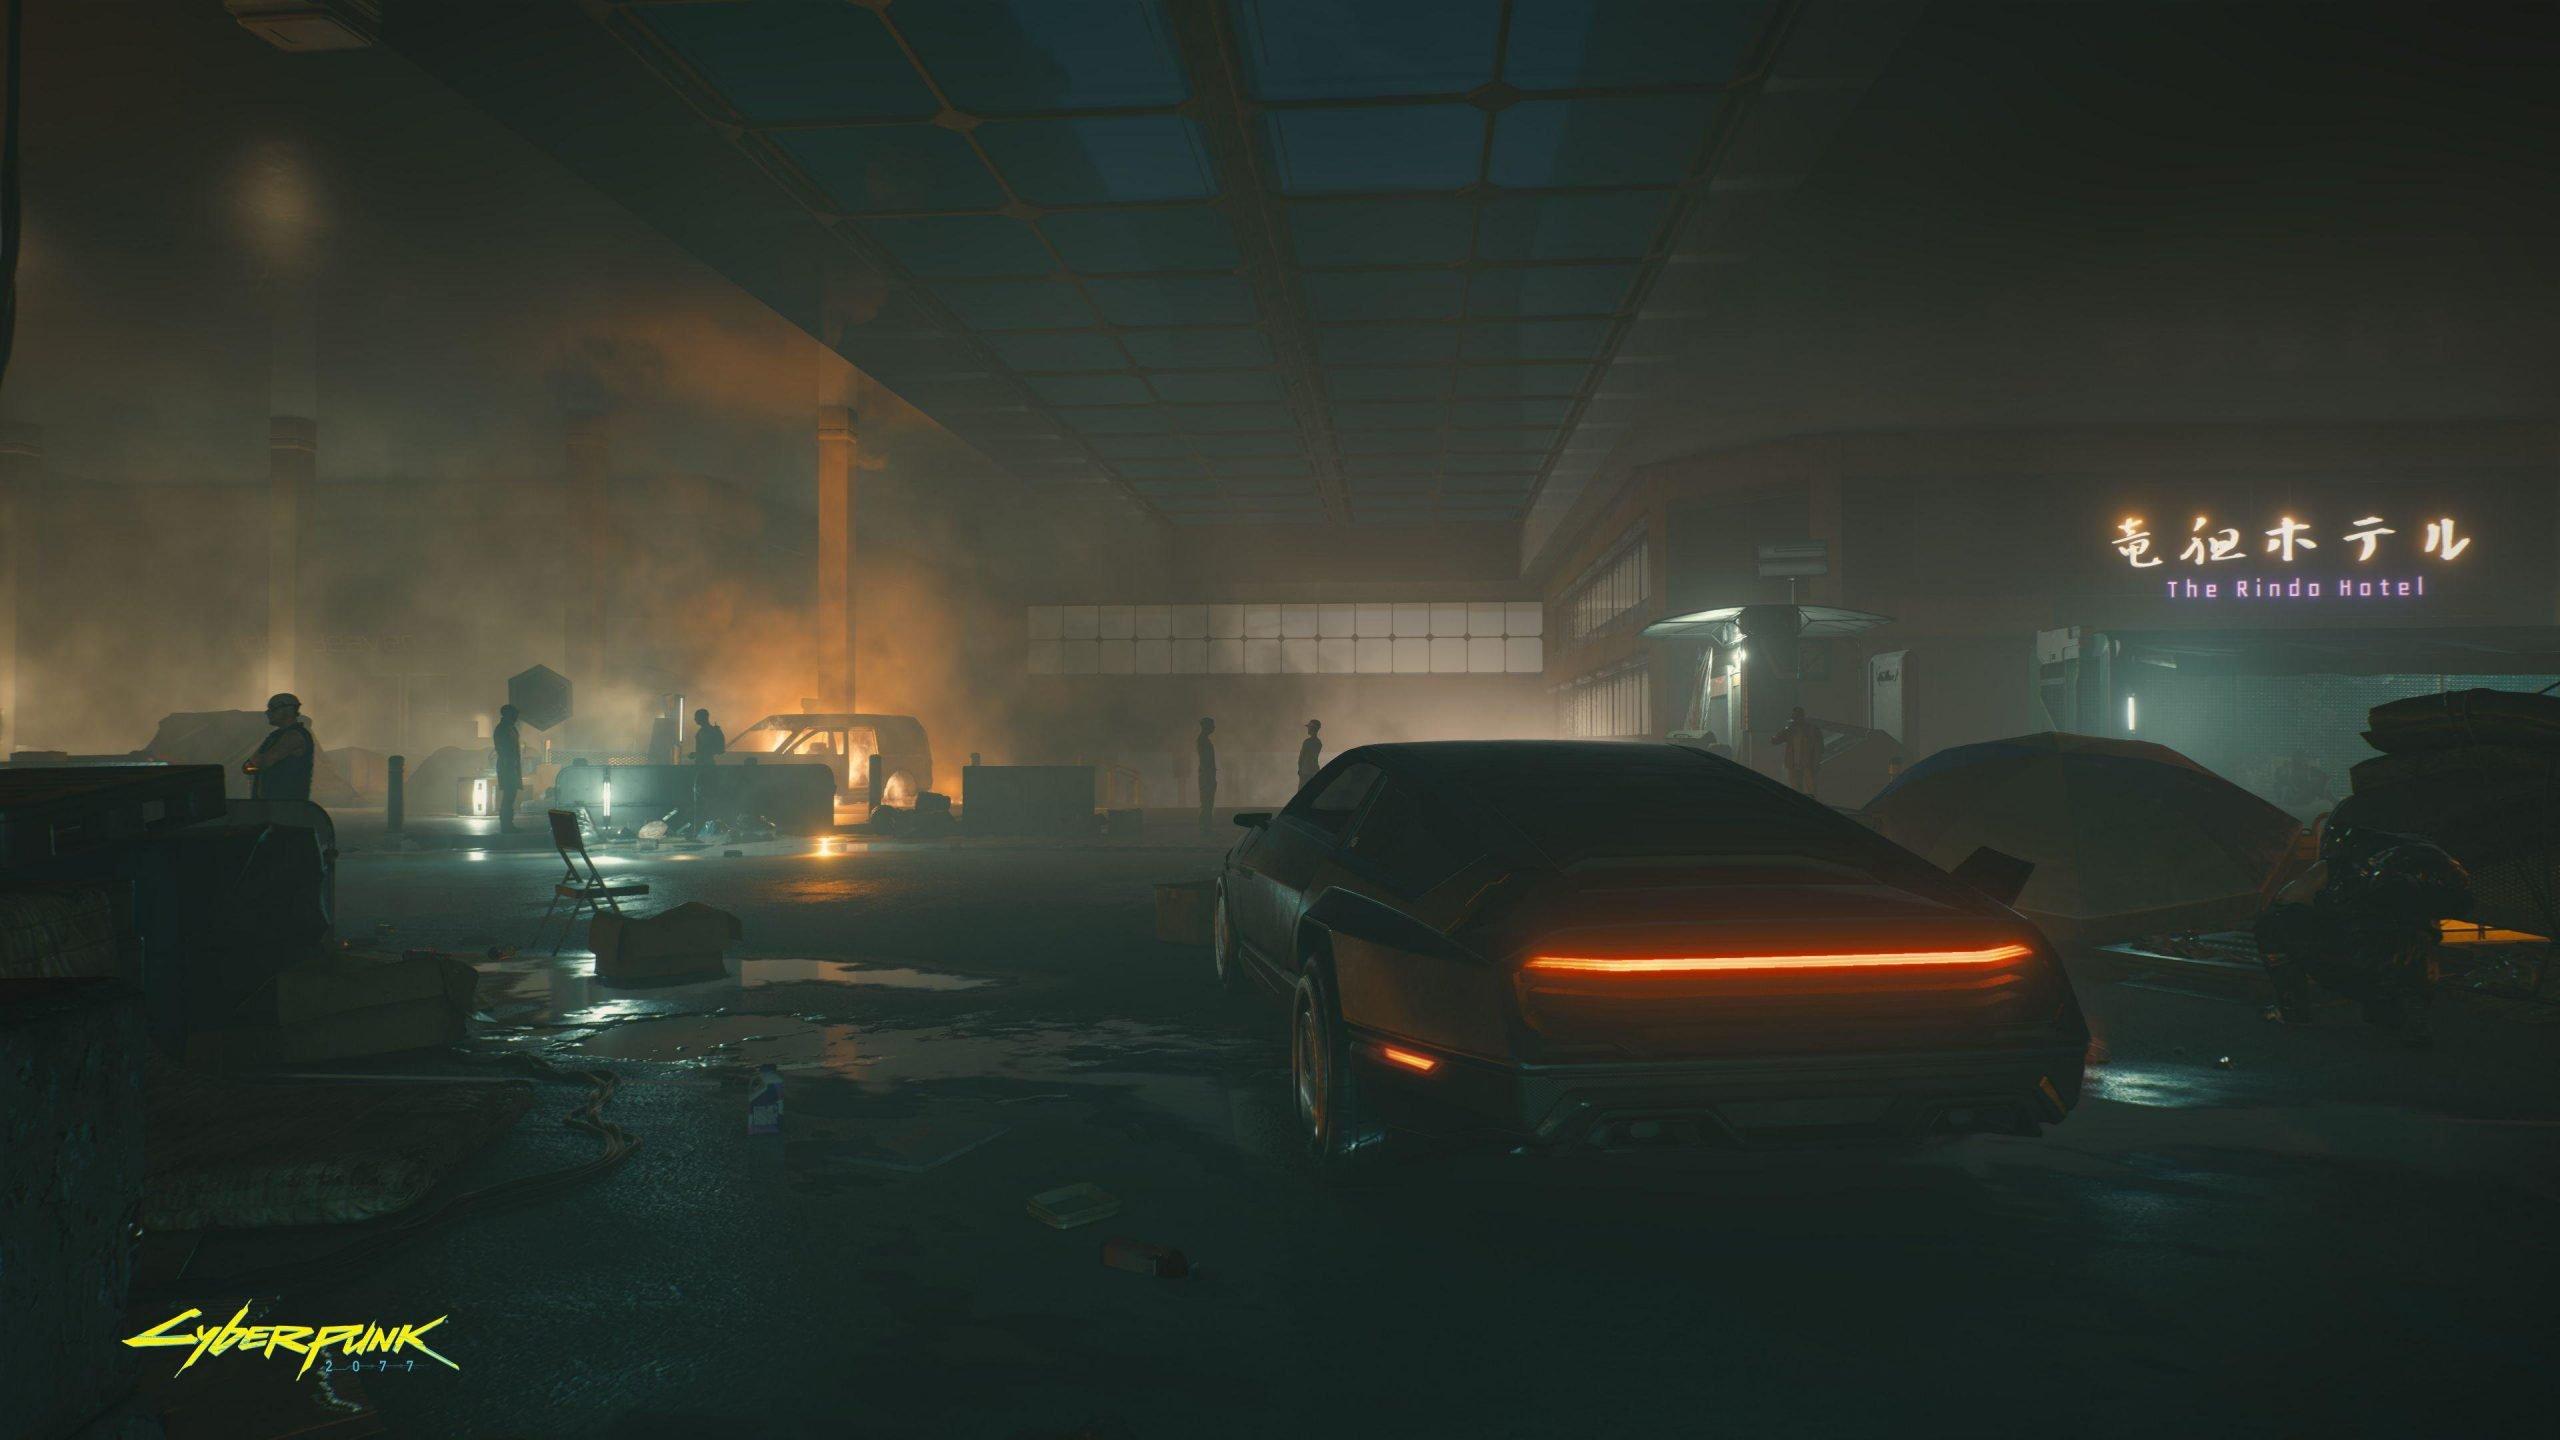 Nova imagem de Cyberpunk 2077 destaca Night City 1